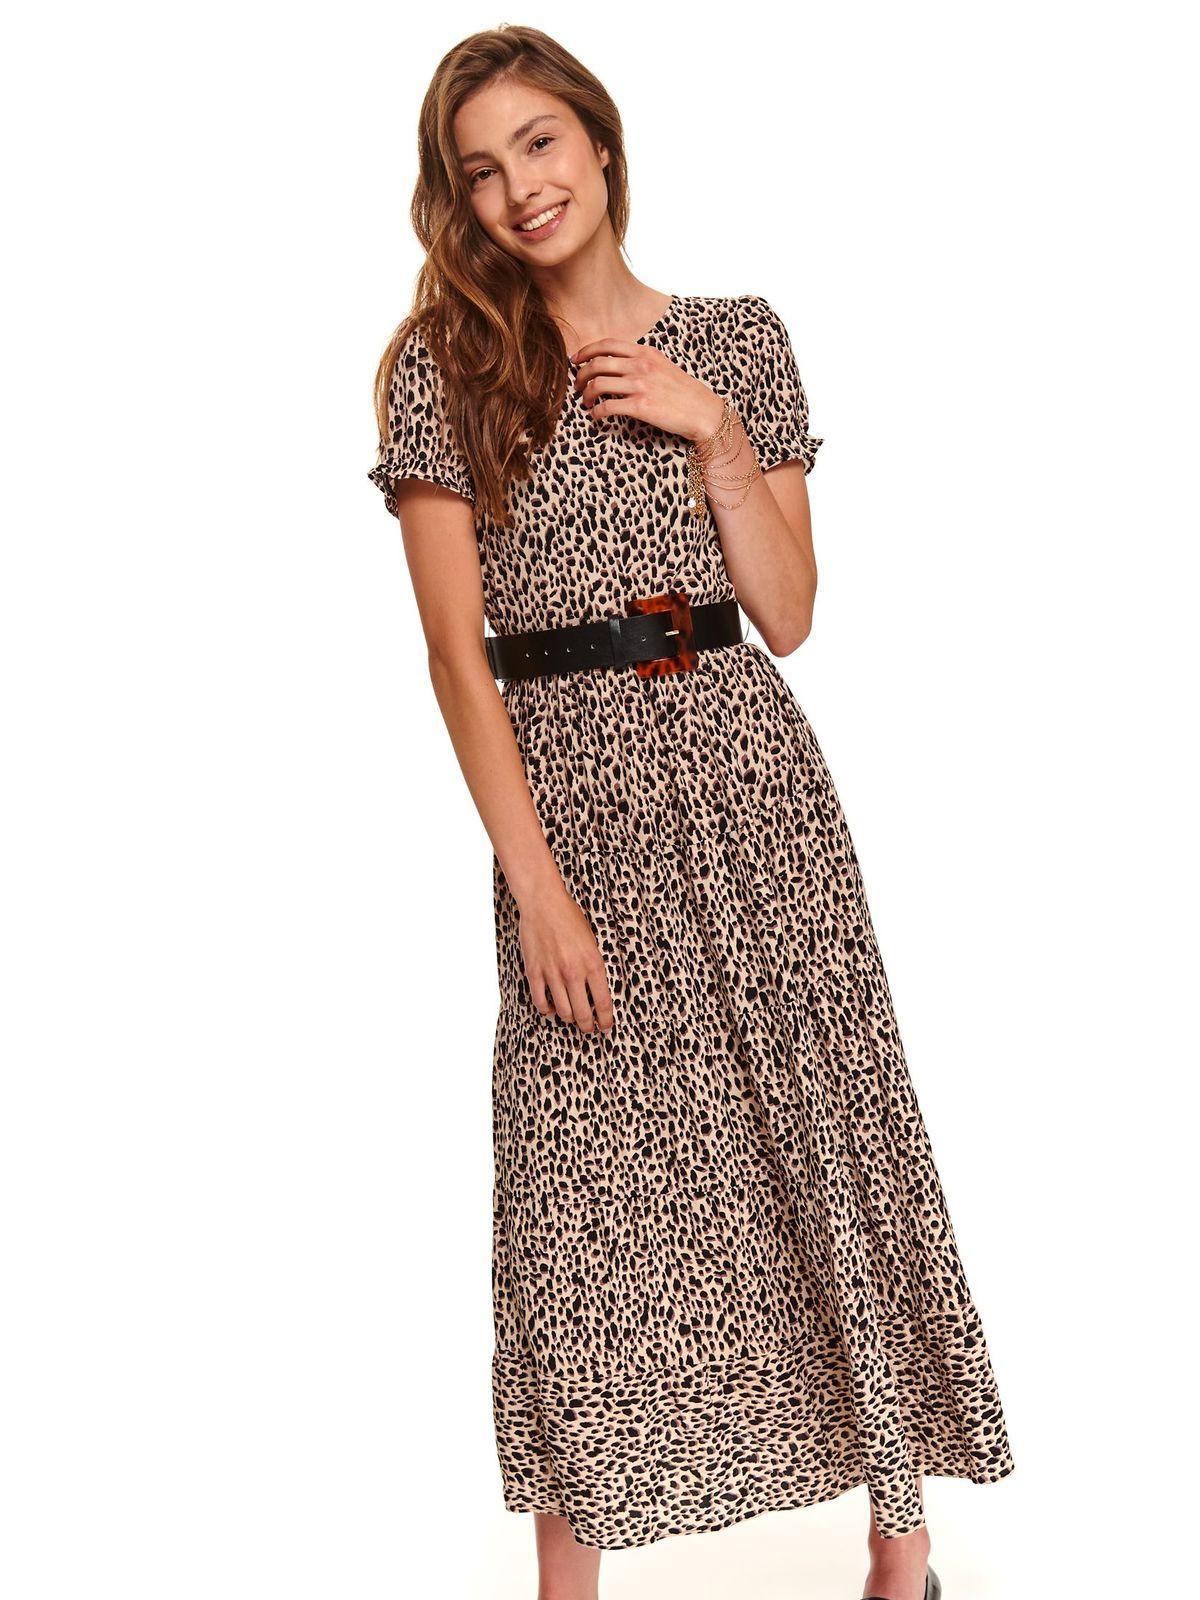 Peach dress daily midi cloche airy fabric accessorized with belt